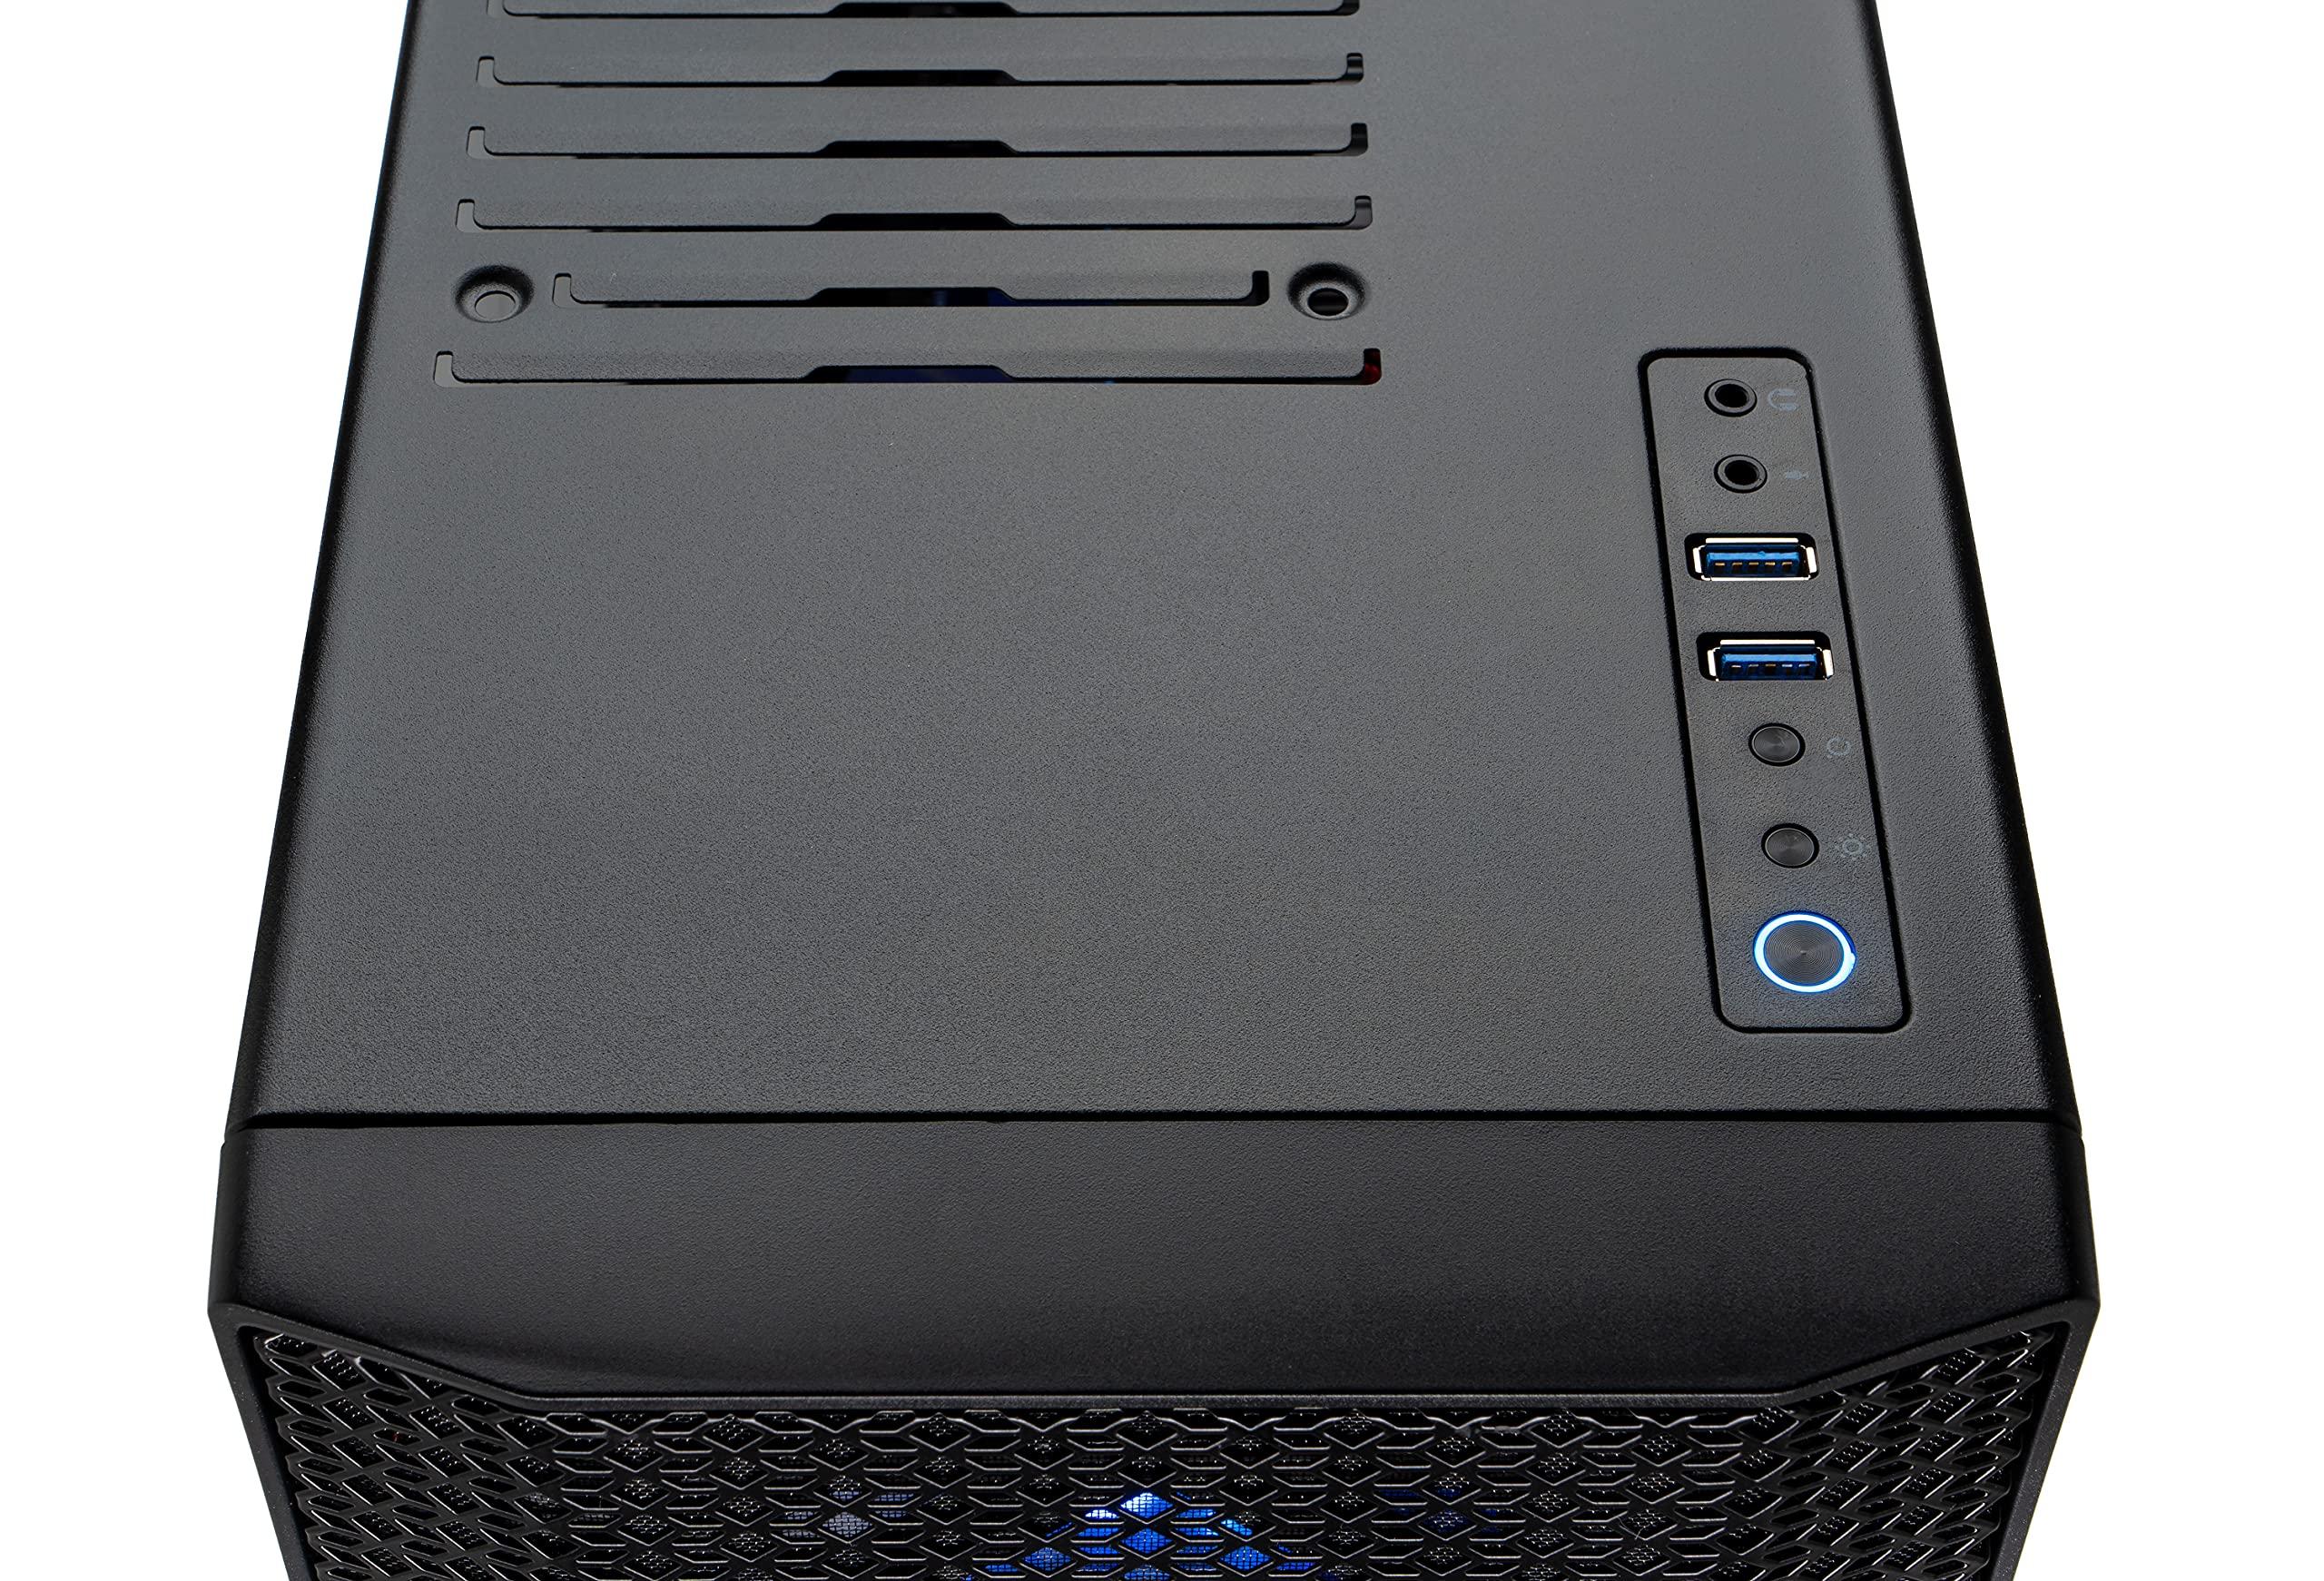 SkyTech Blaze 3.0 Gaming PC Desktop – AMD Ryzen 5 3600 3.6GHz, RTX 3060 Ti 8G GDDR6, 1TB NVMe, 16G DDR4 3000, 600W Gold PSU, AC Wi-Fi, Windows 10 Home 64-bit, Black